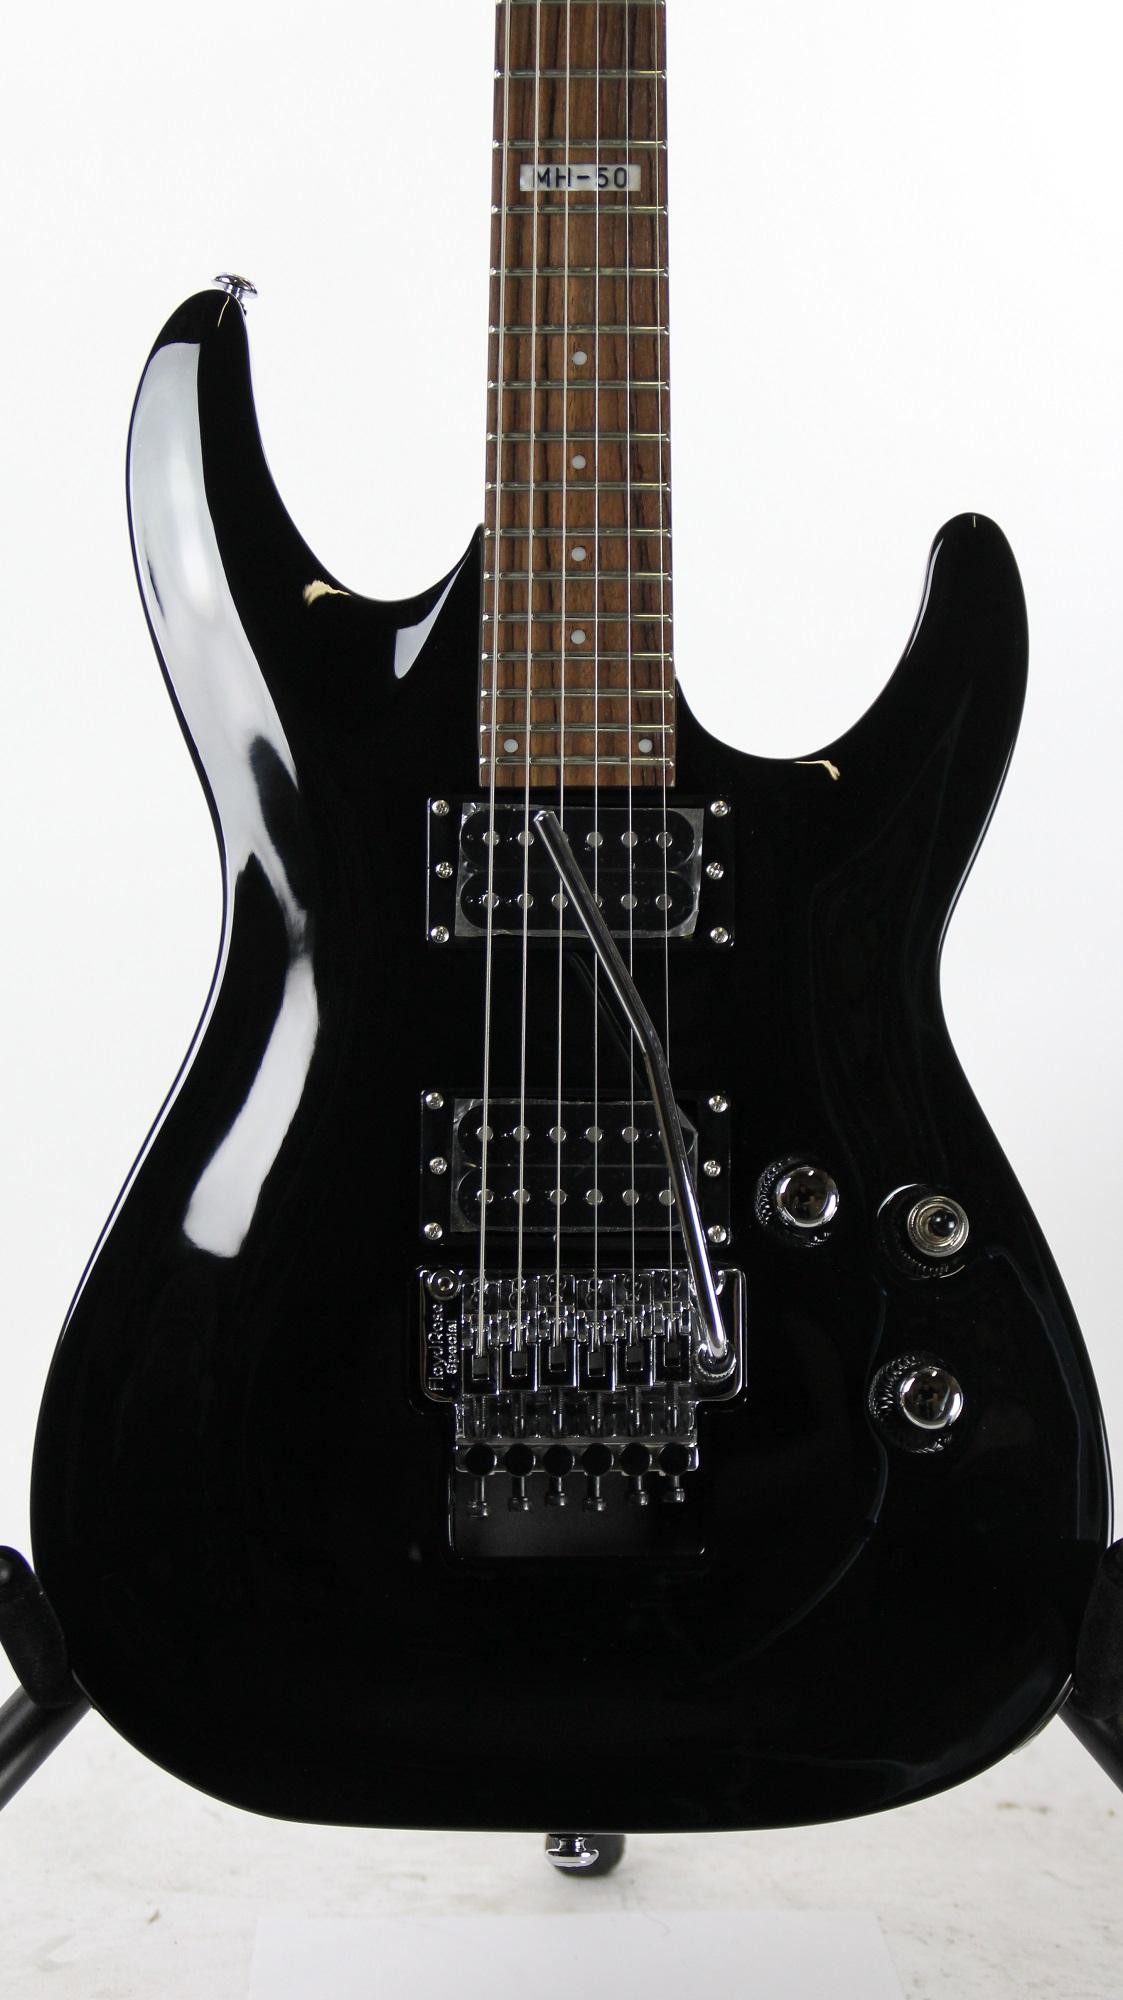 esp ltd mh 50 black sample prototype electric guitar 6. Black Bedroom Furniture Sets. Home Design Ideas